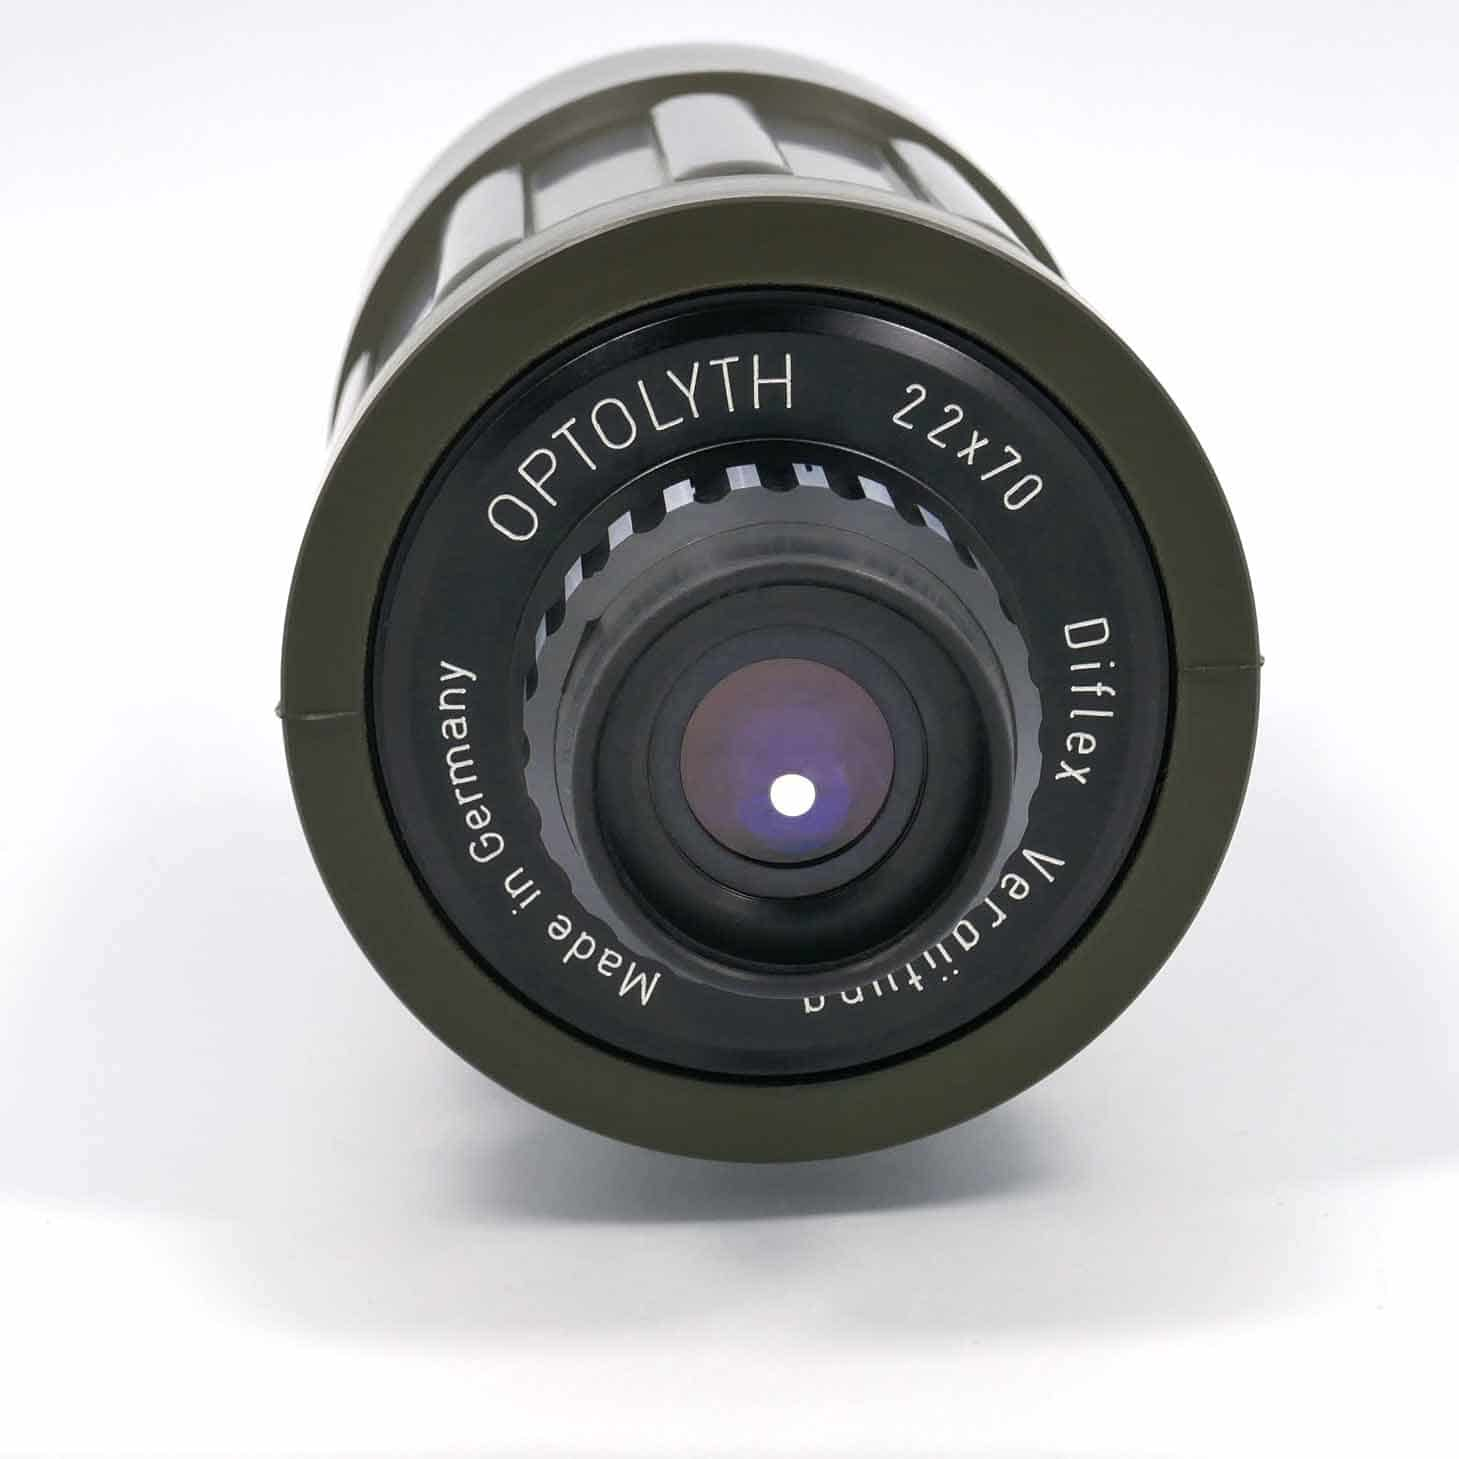 clean-cameras-optolyth-22x70-diflex-06